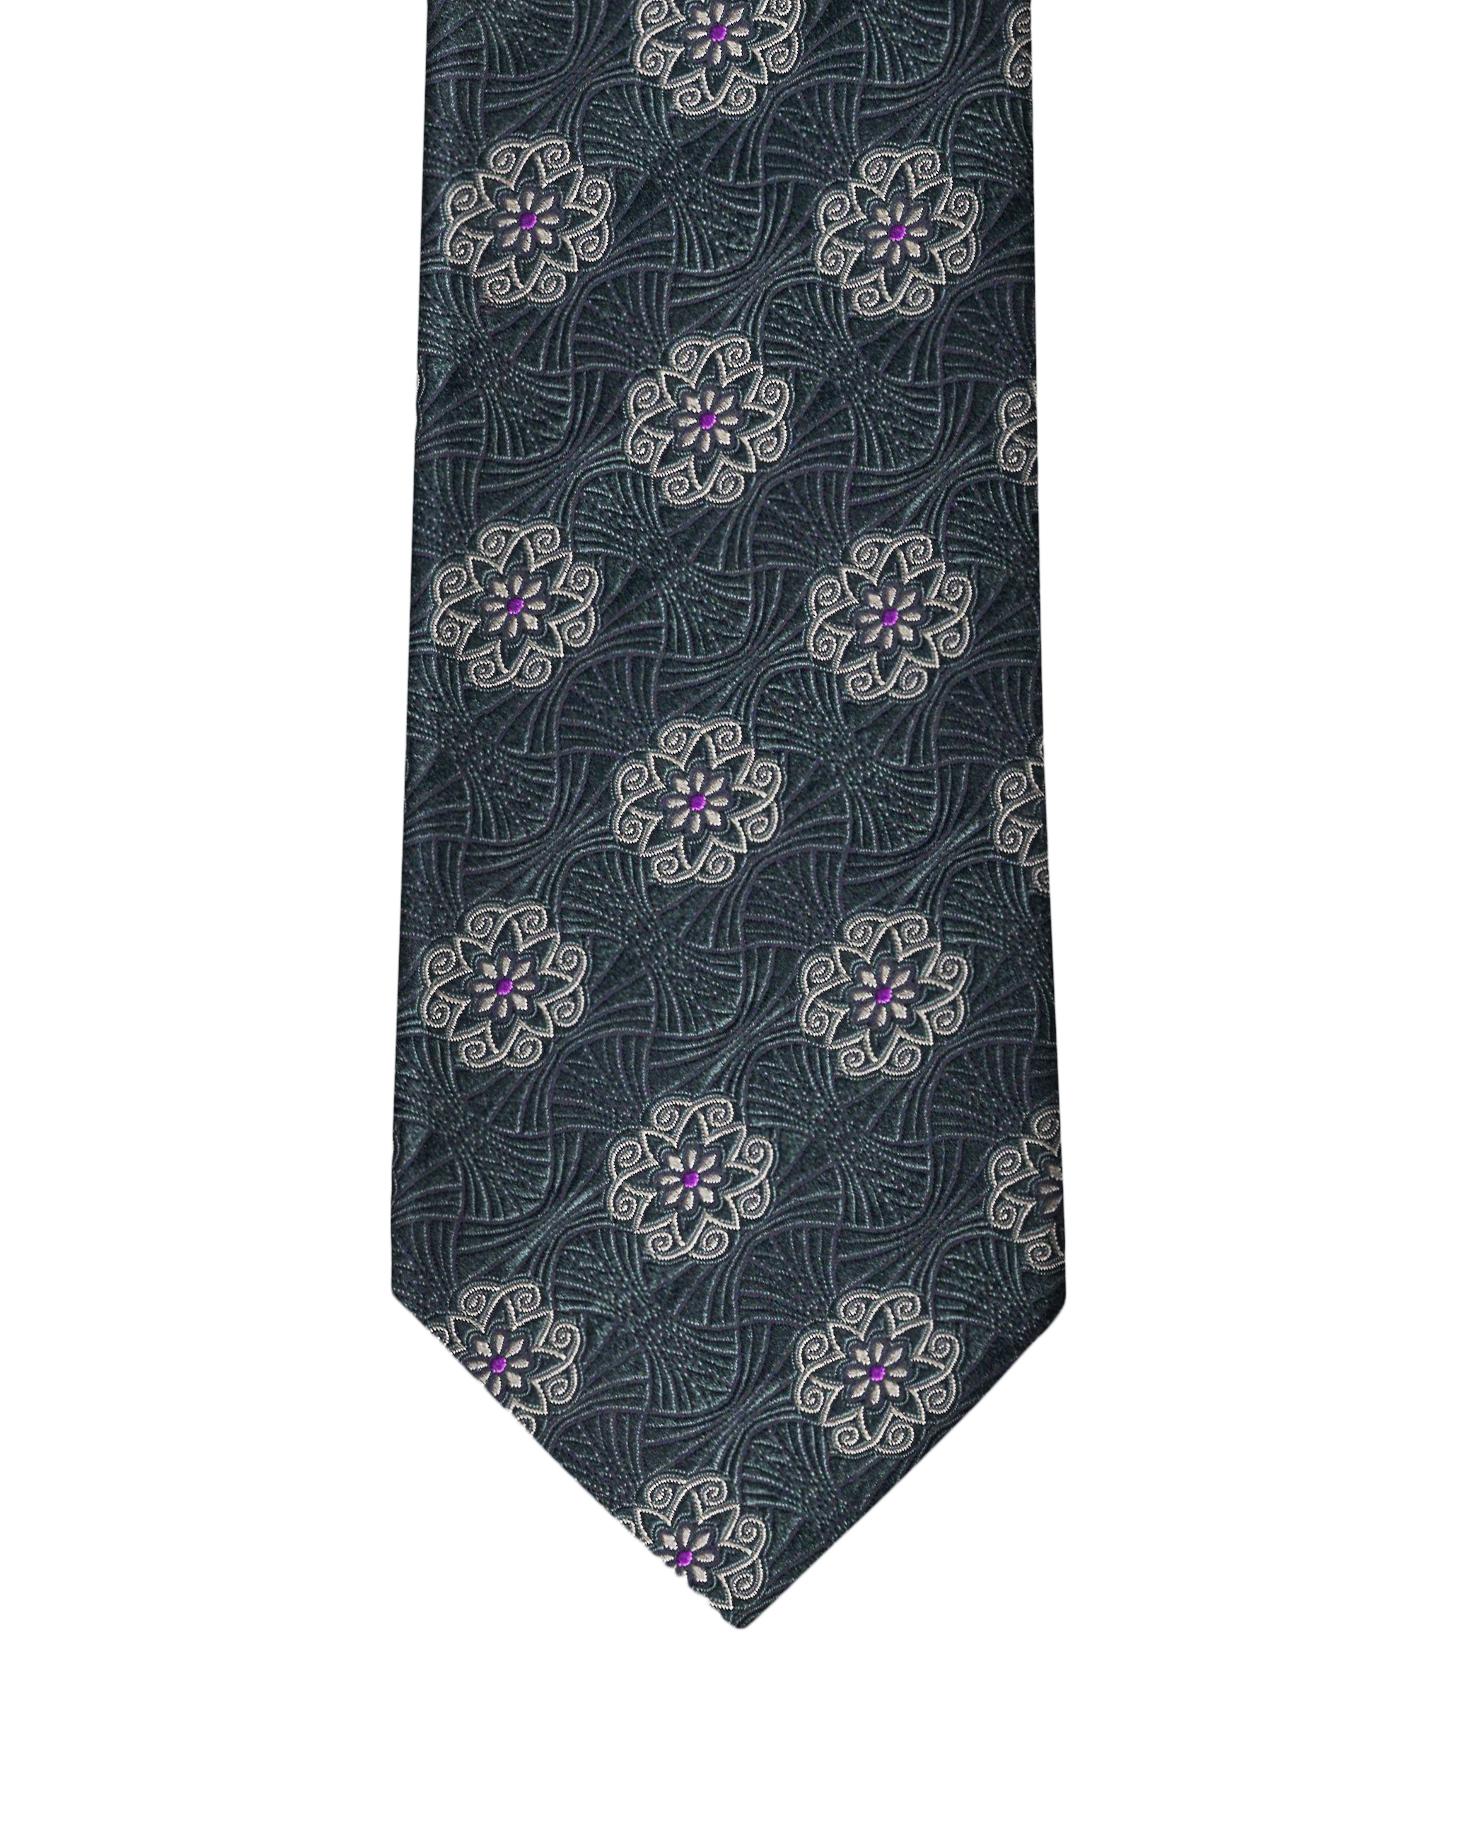 Hunter Green Heraldic Medallion Necktie